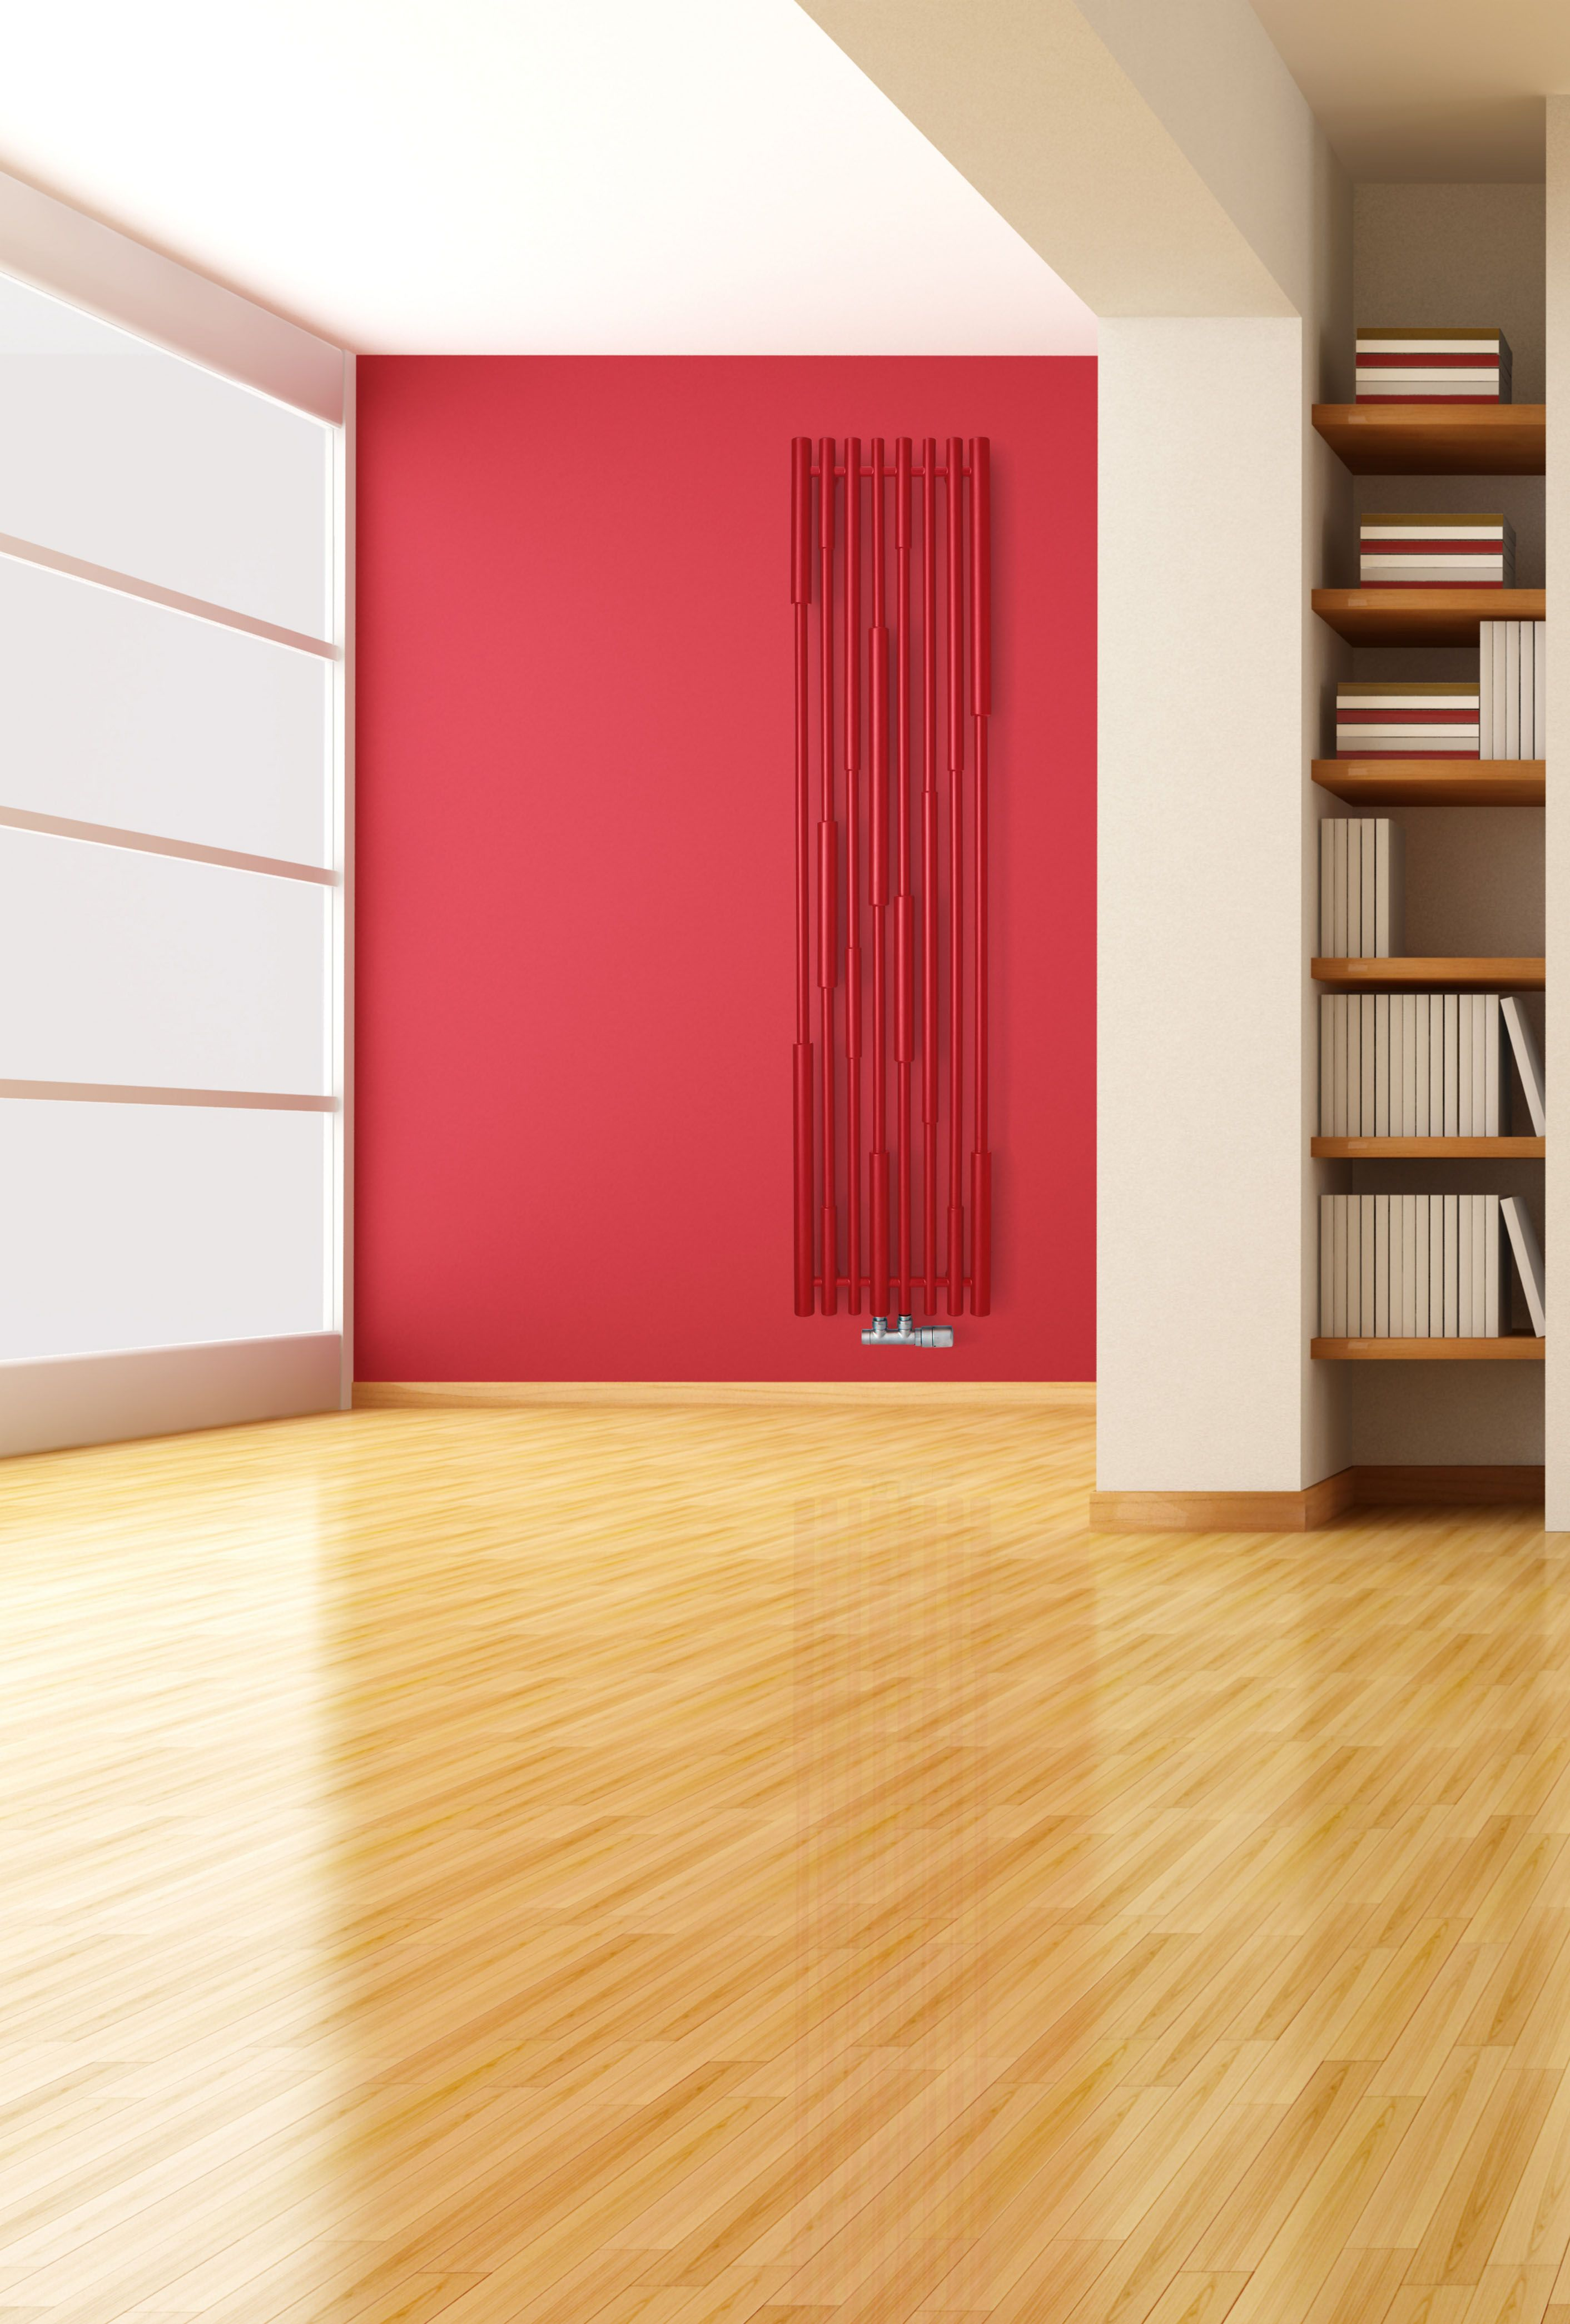 Designer Living Room Radiators: #Cane #radiator In The #LivingRoom. #Forthehome